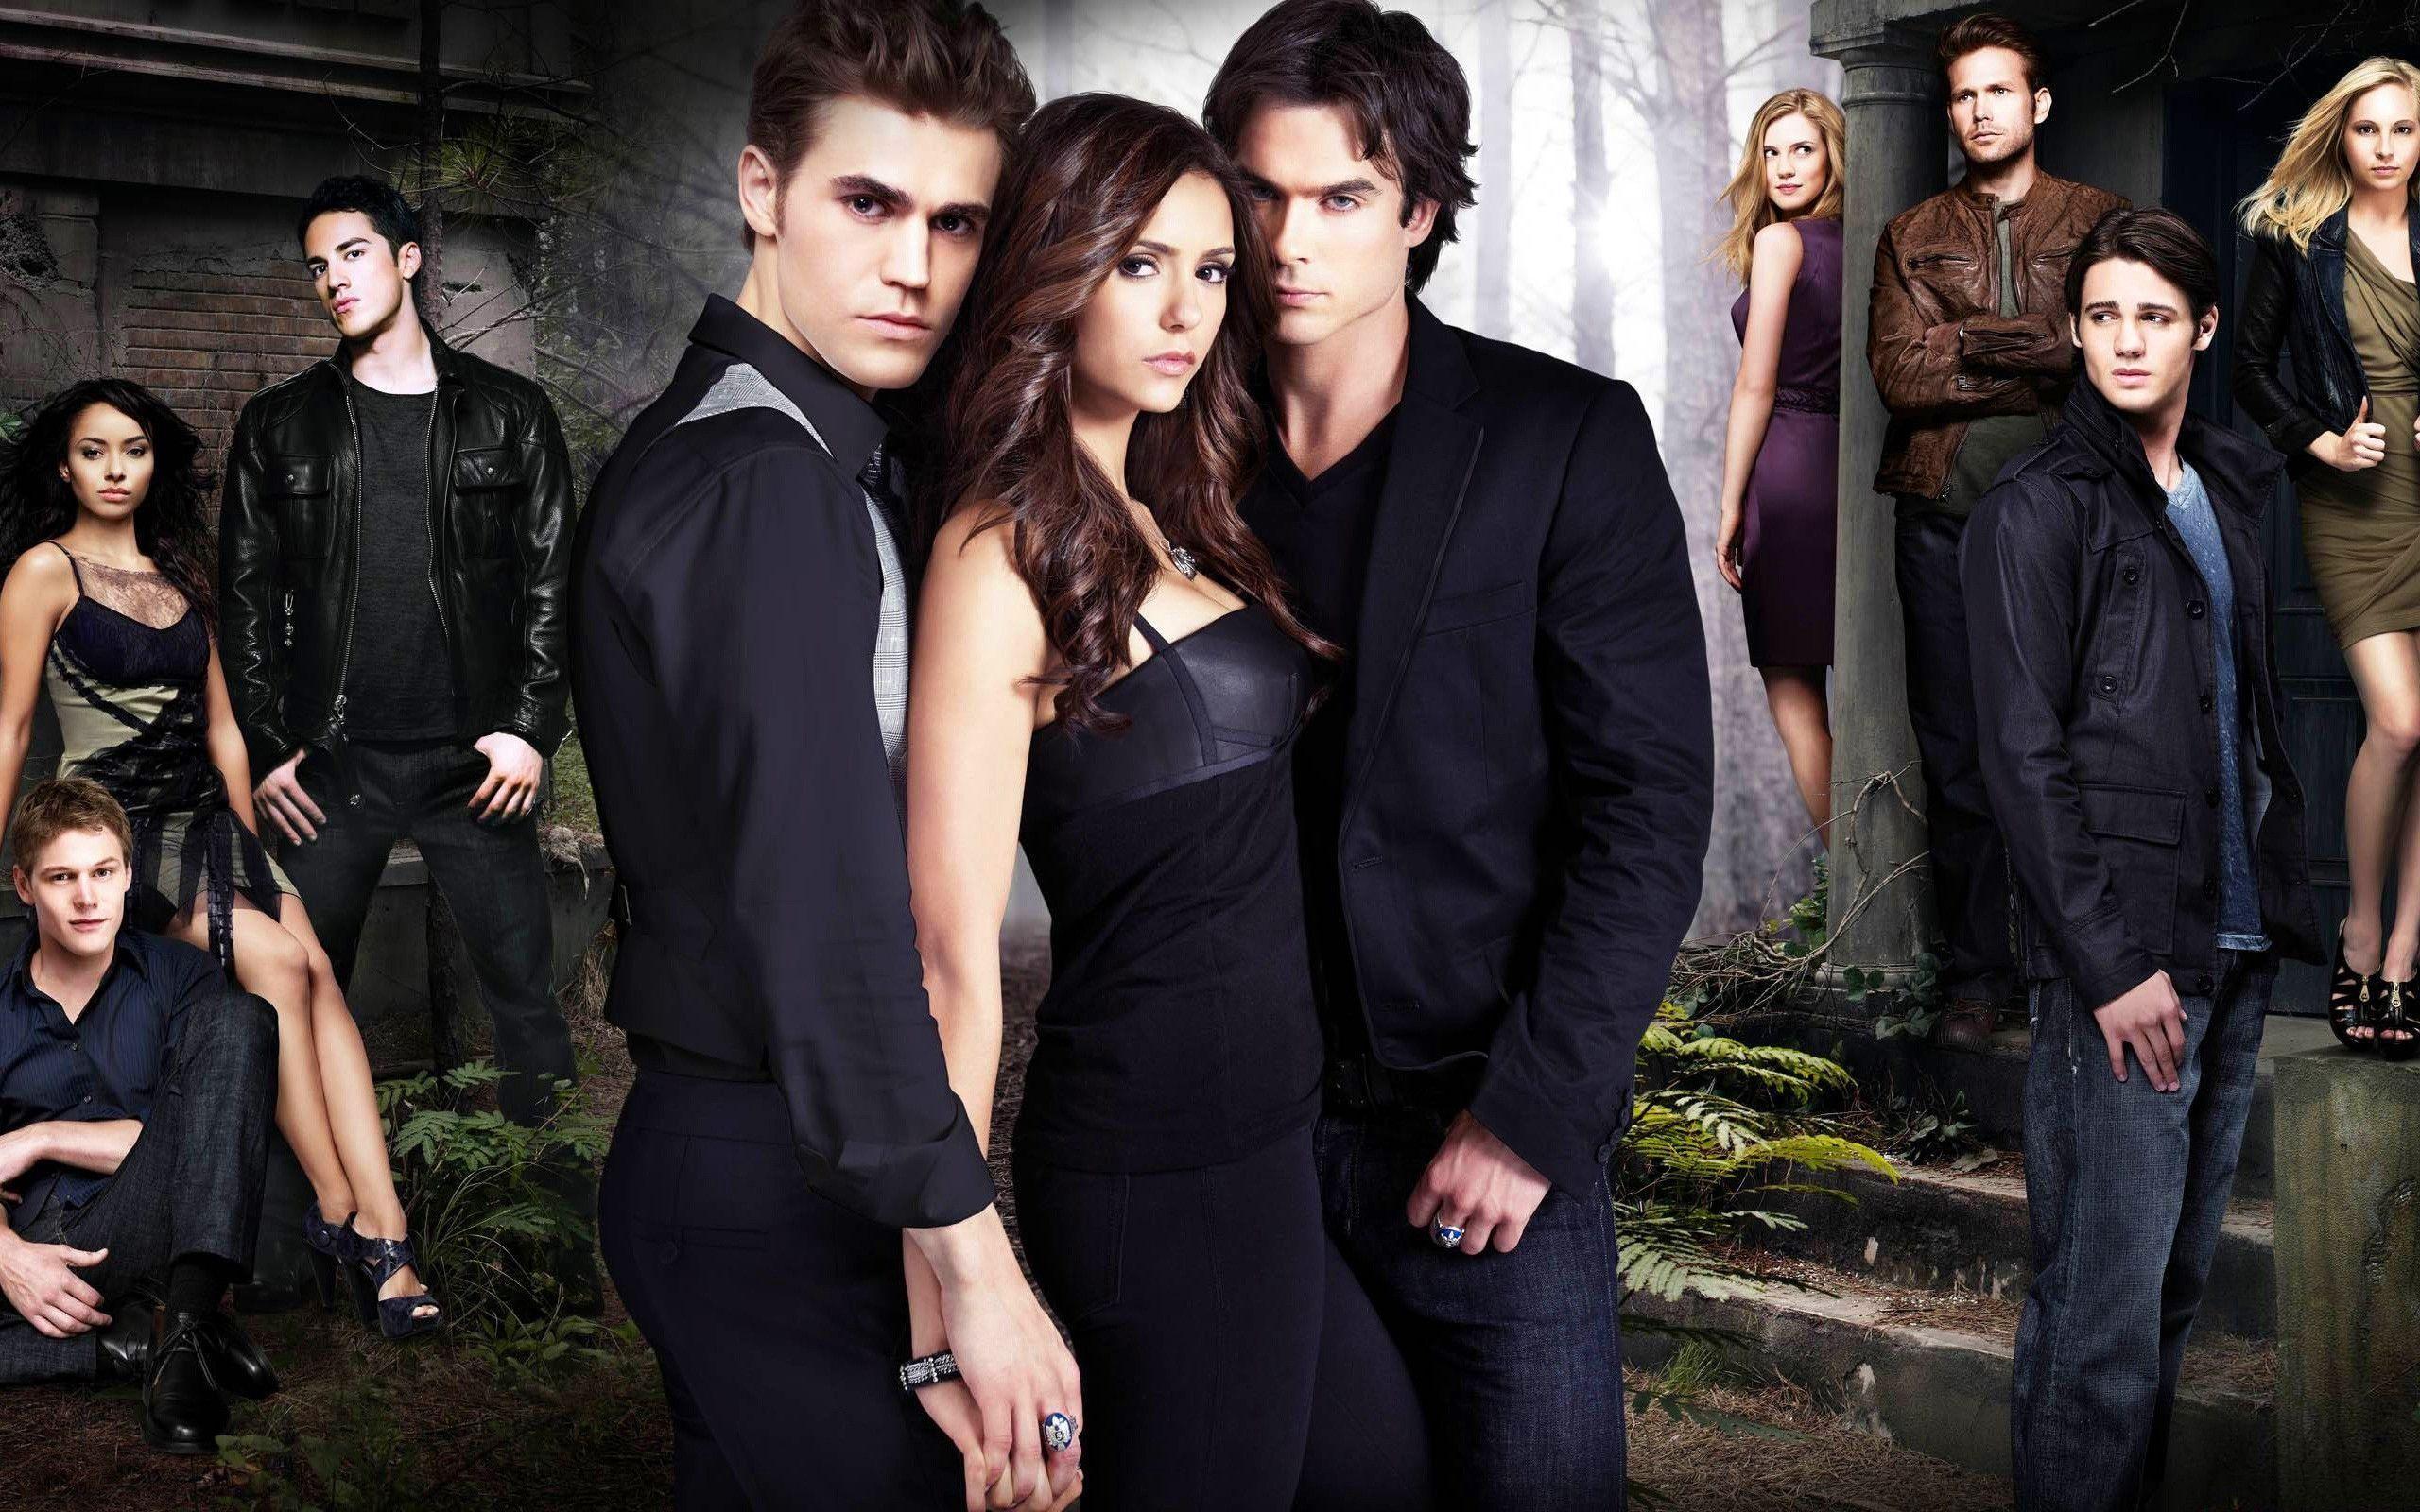 The Vampire Diaries Season 2 Wallpapers Hd Wallpapers Vampire